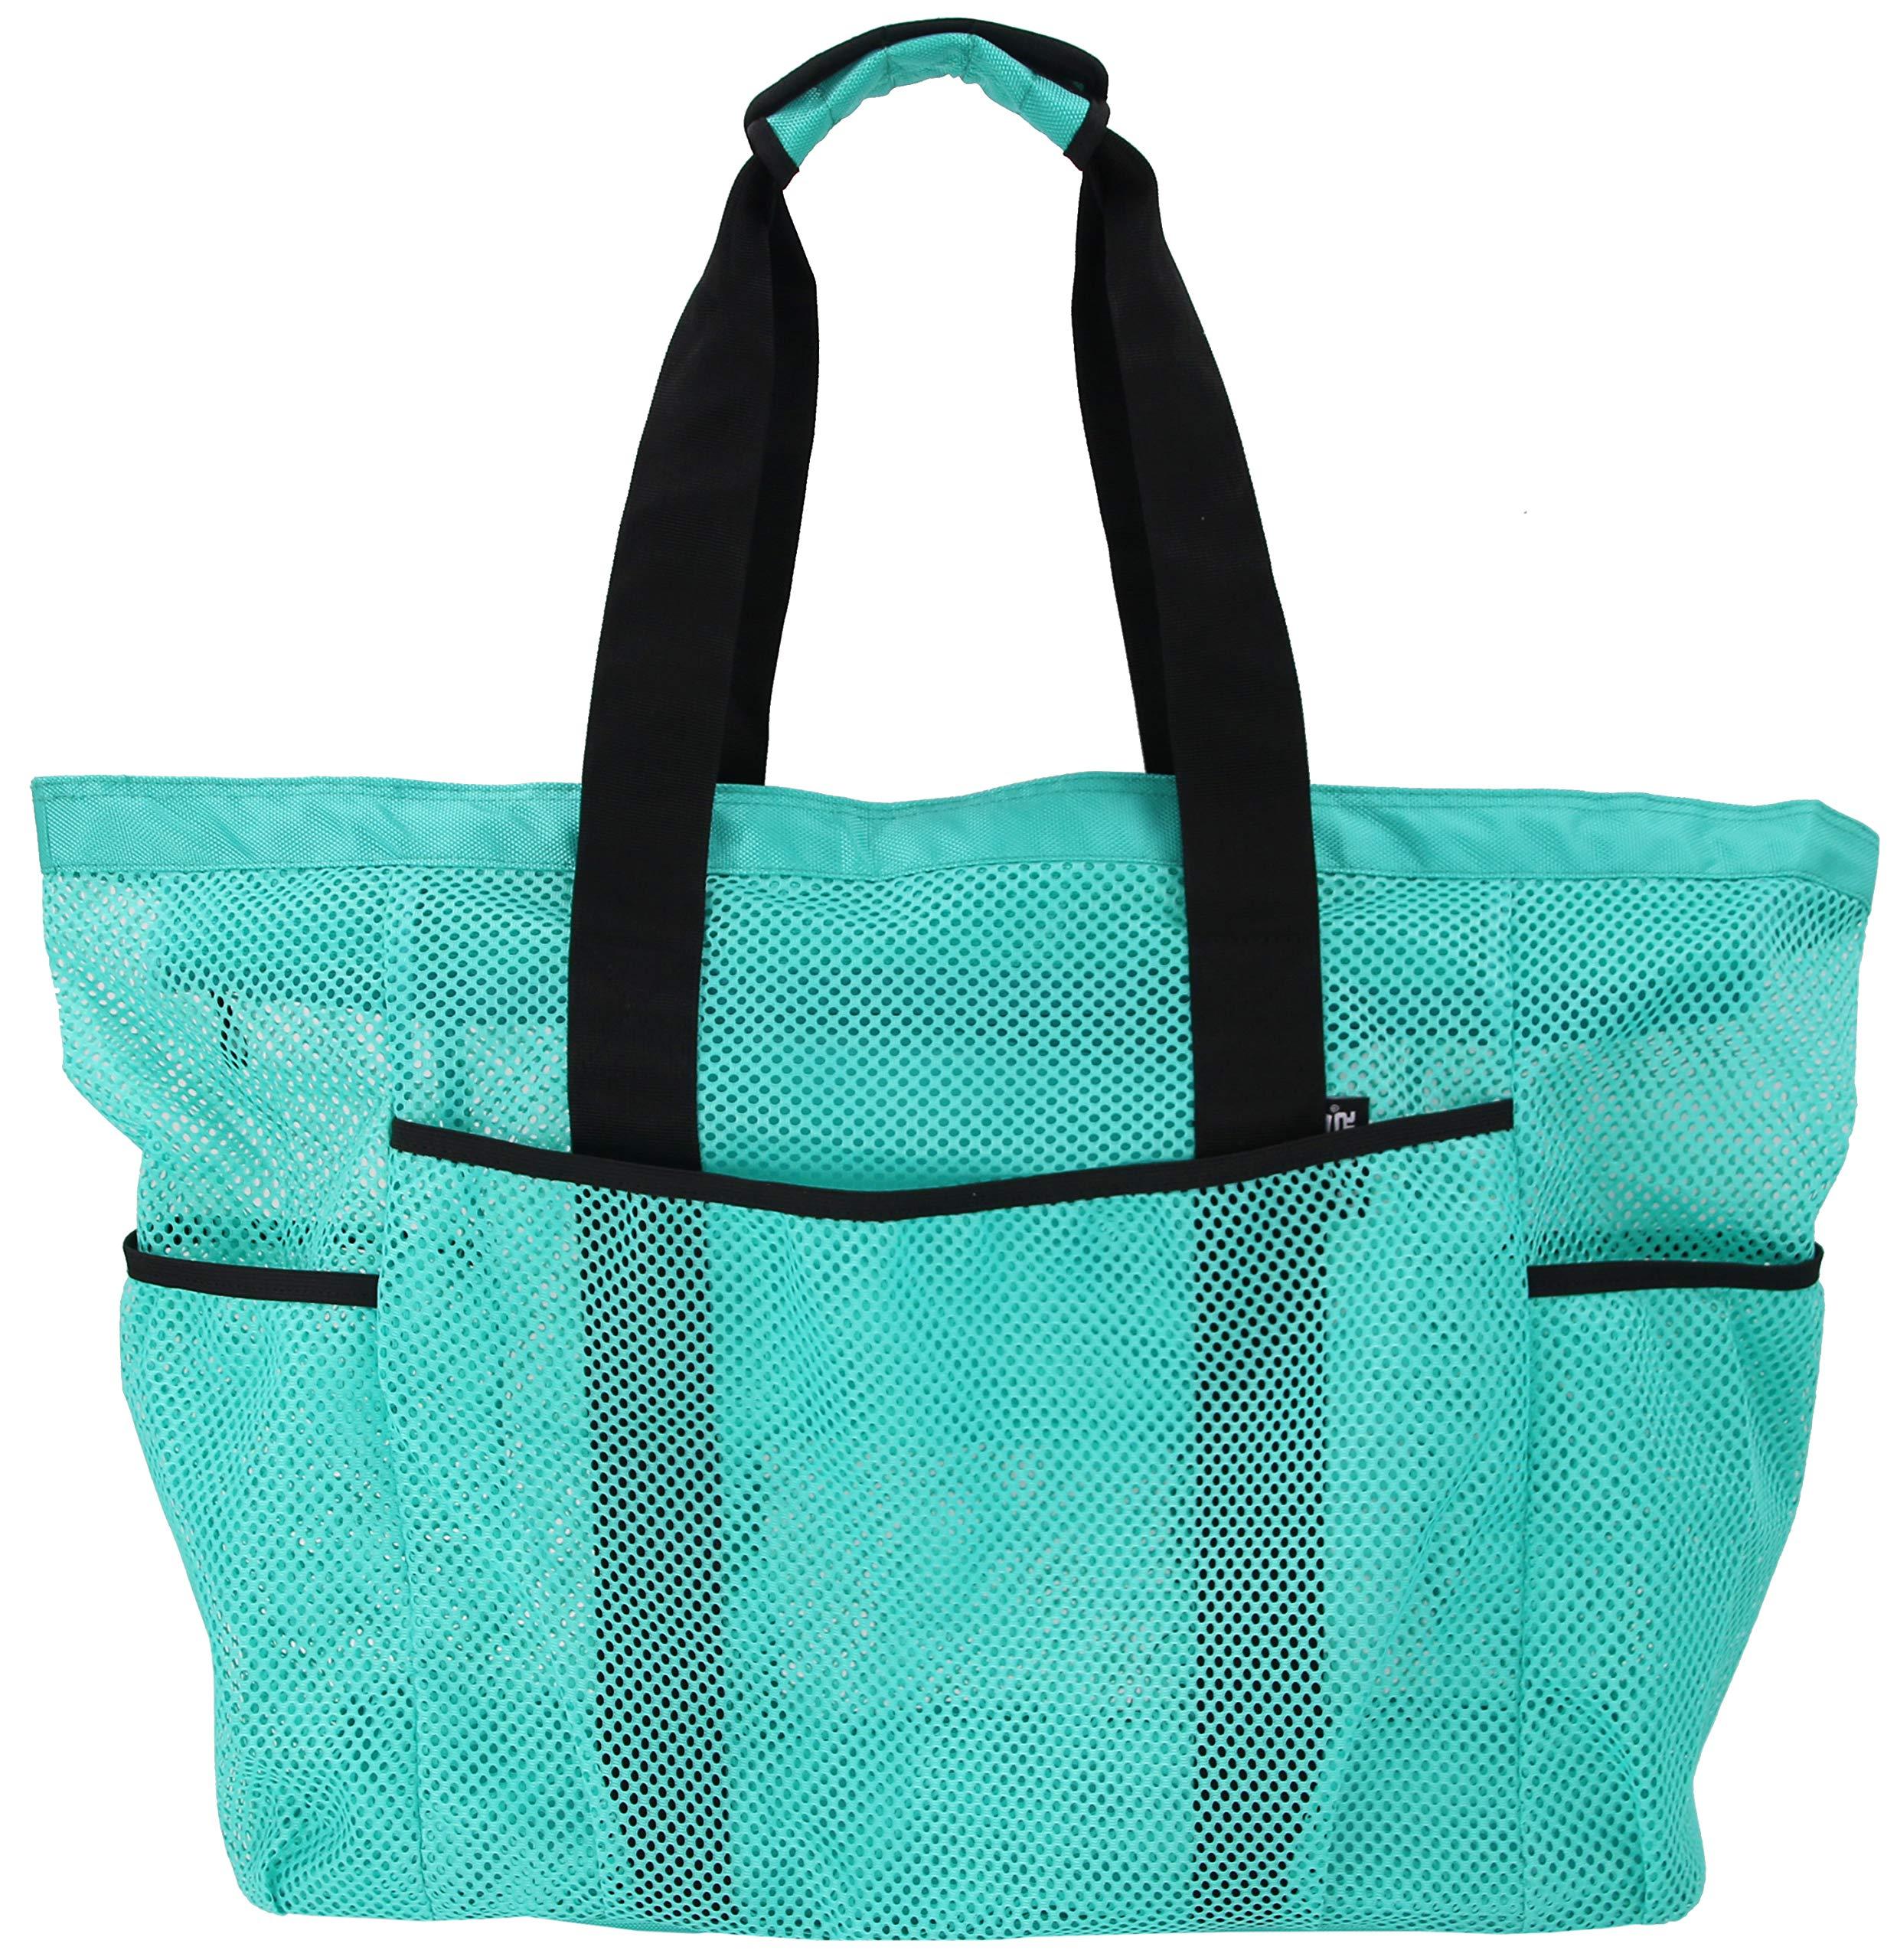 QOGiR Mesh Beach Bag Tote- Large, Light Weight, Durable and Zip Top Closure (Green)